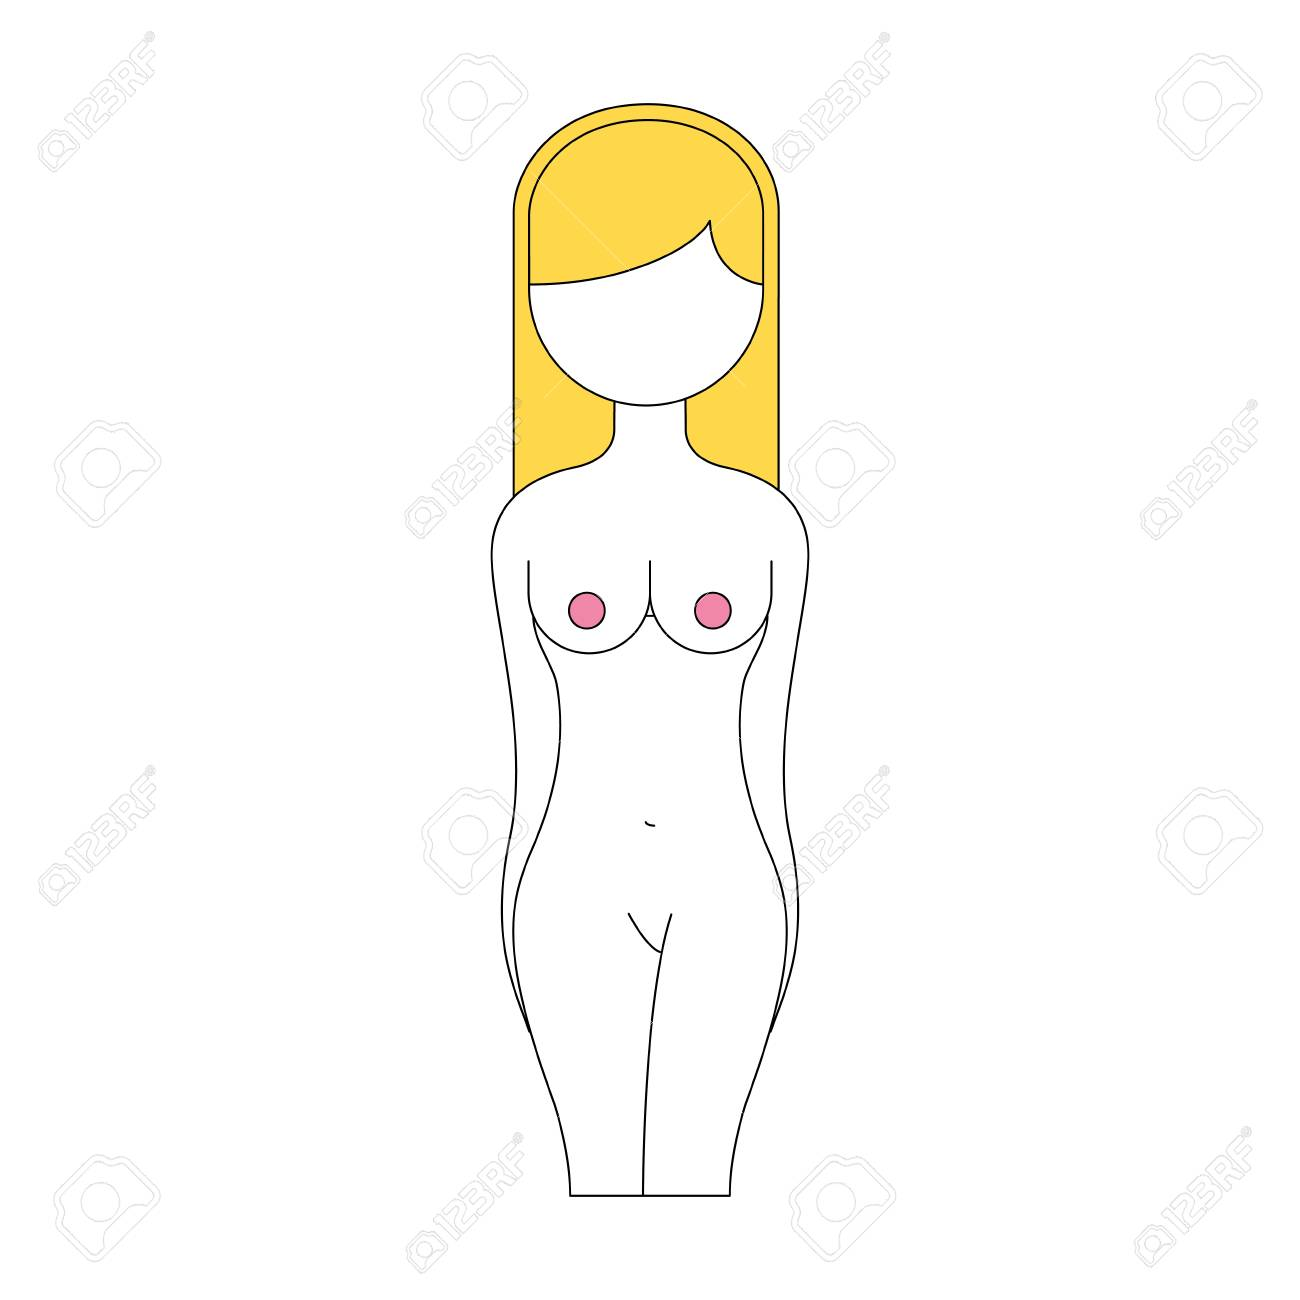 Female Torso Anatomy Silhouette Vector Illustration Design Royalty